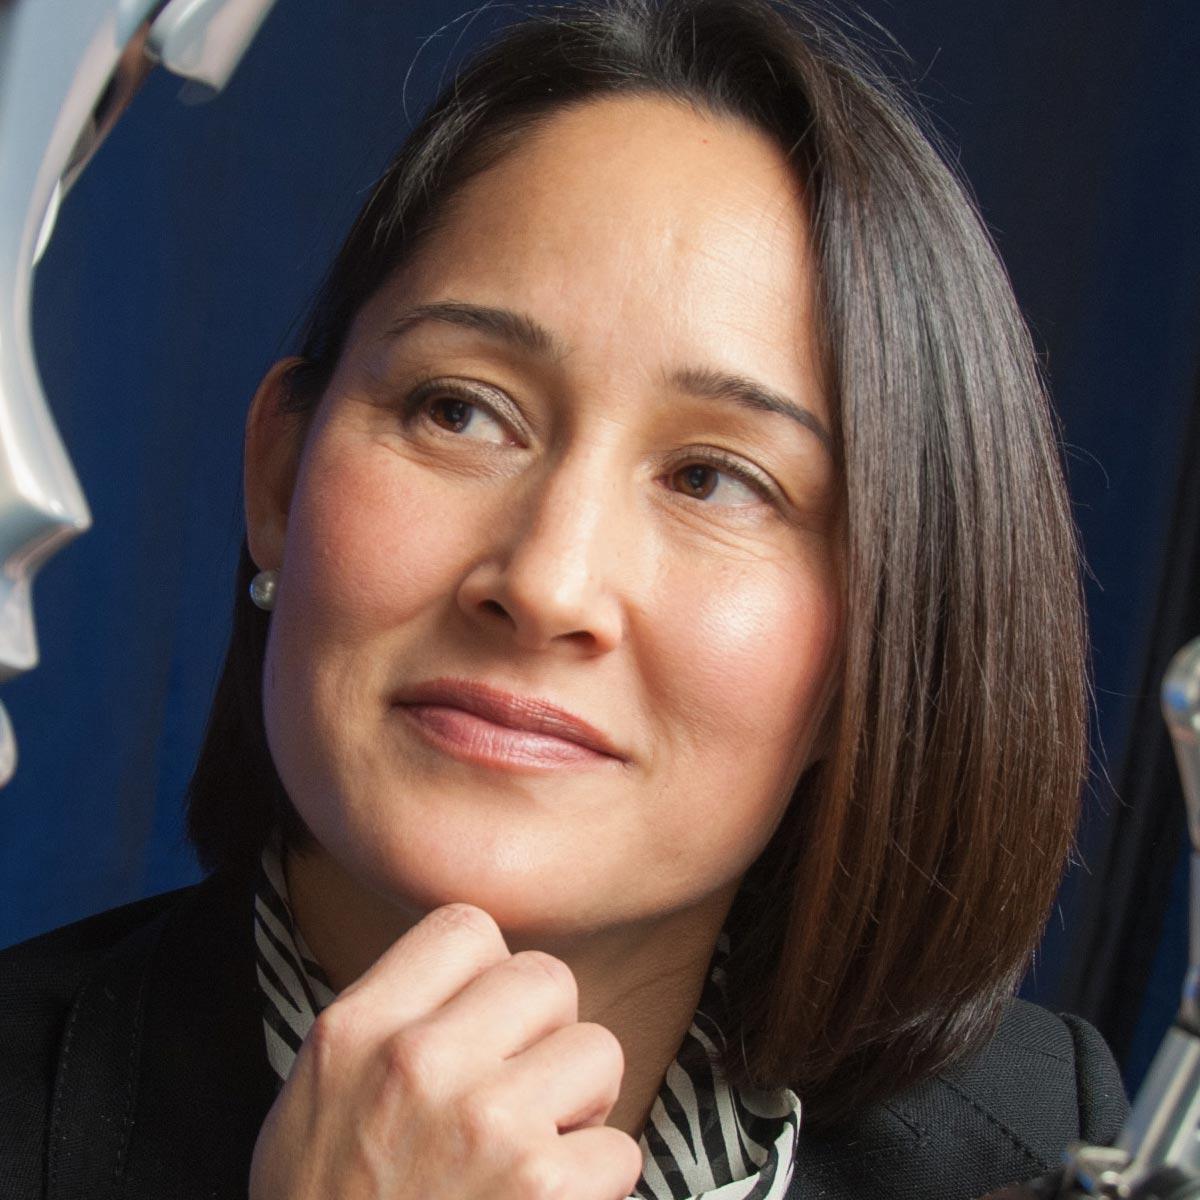 Cynthia Breazeal